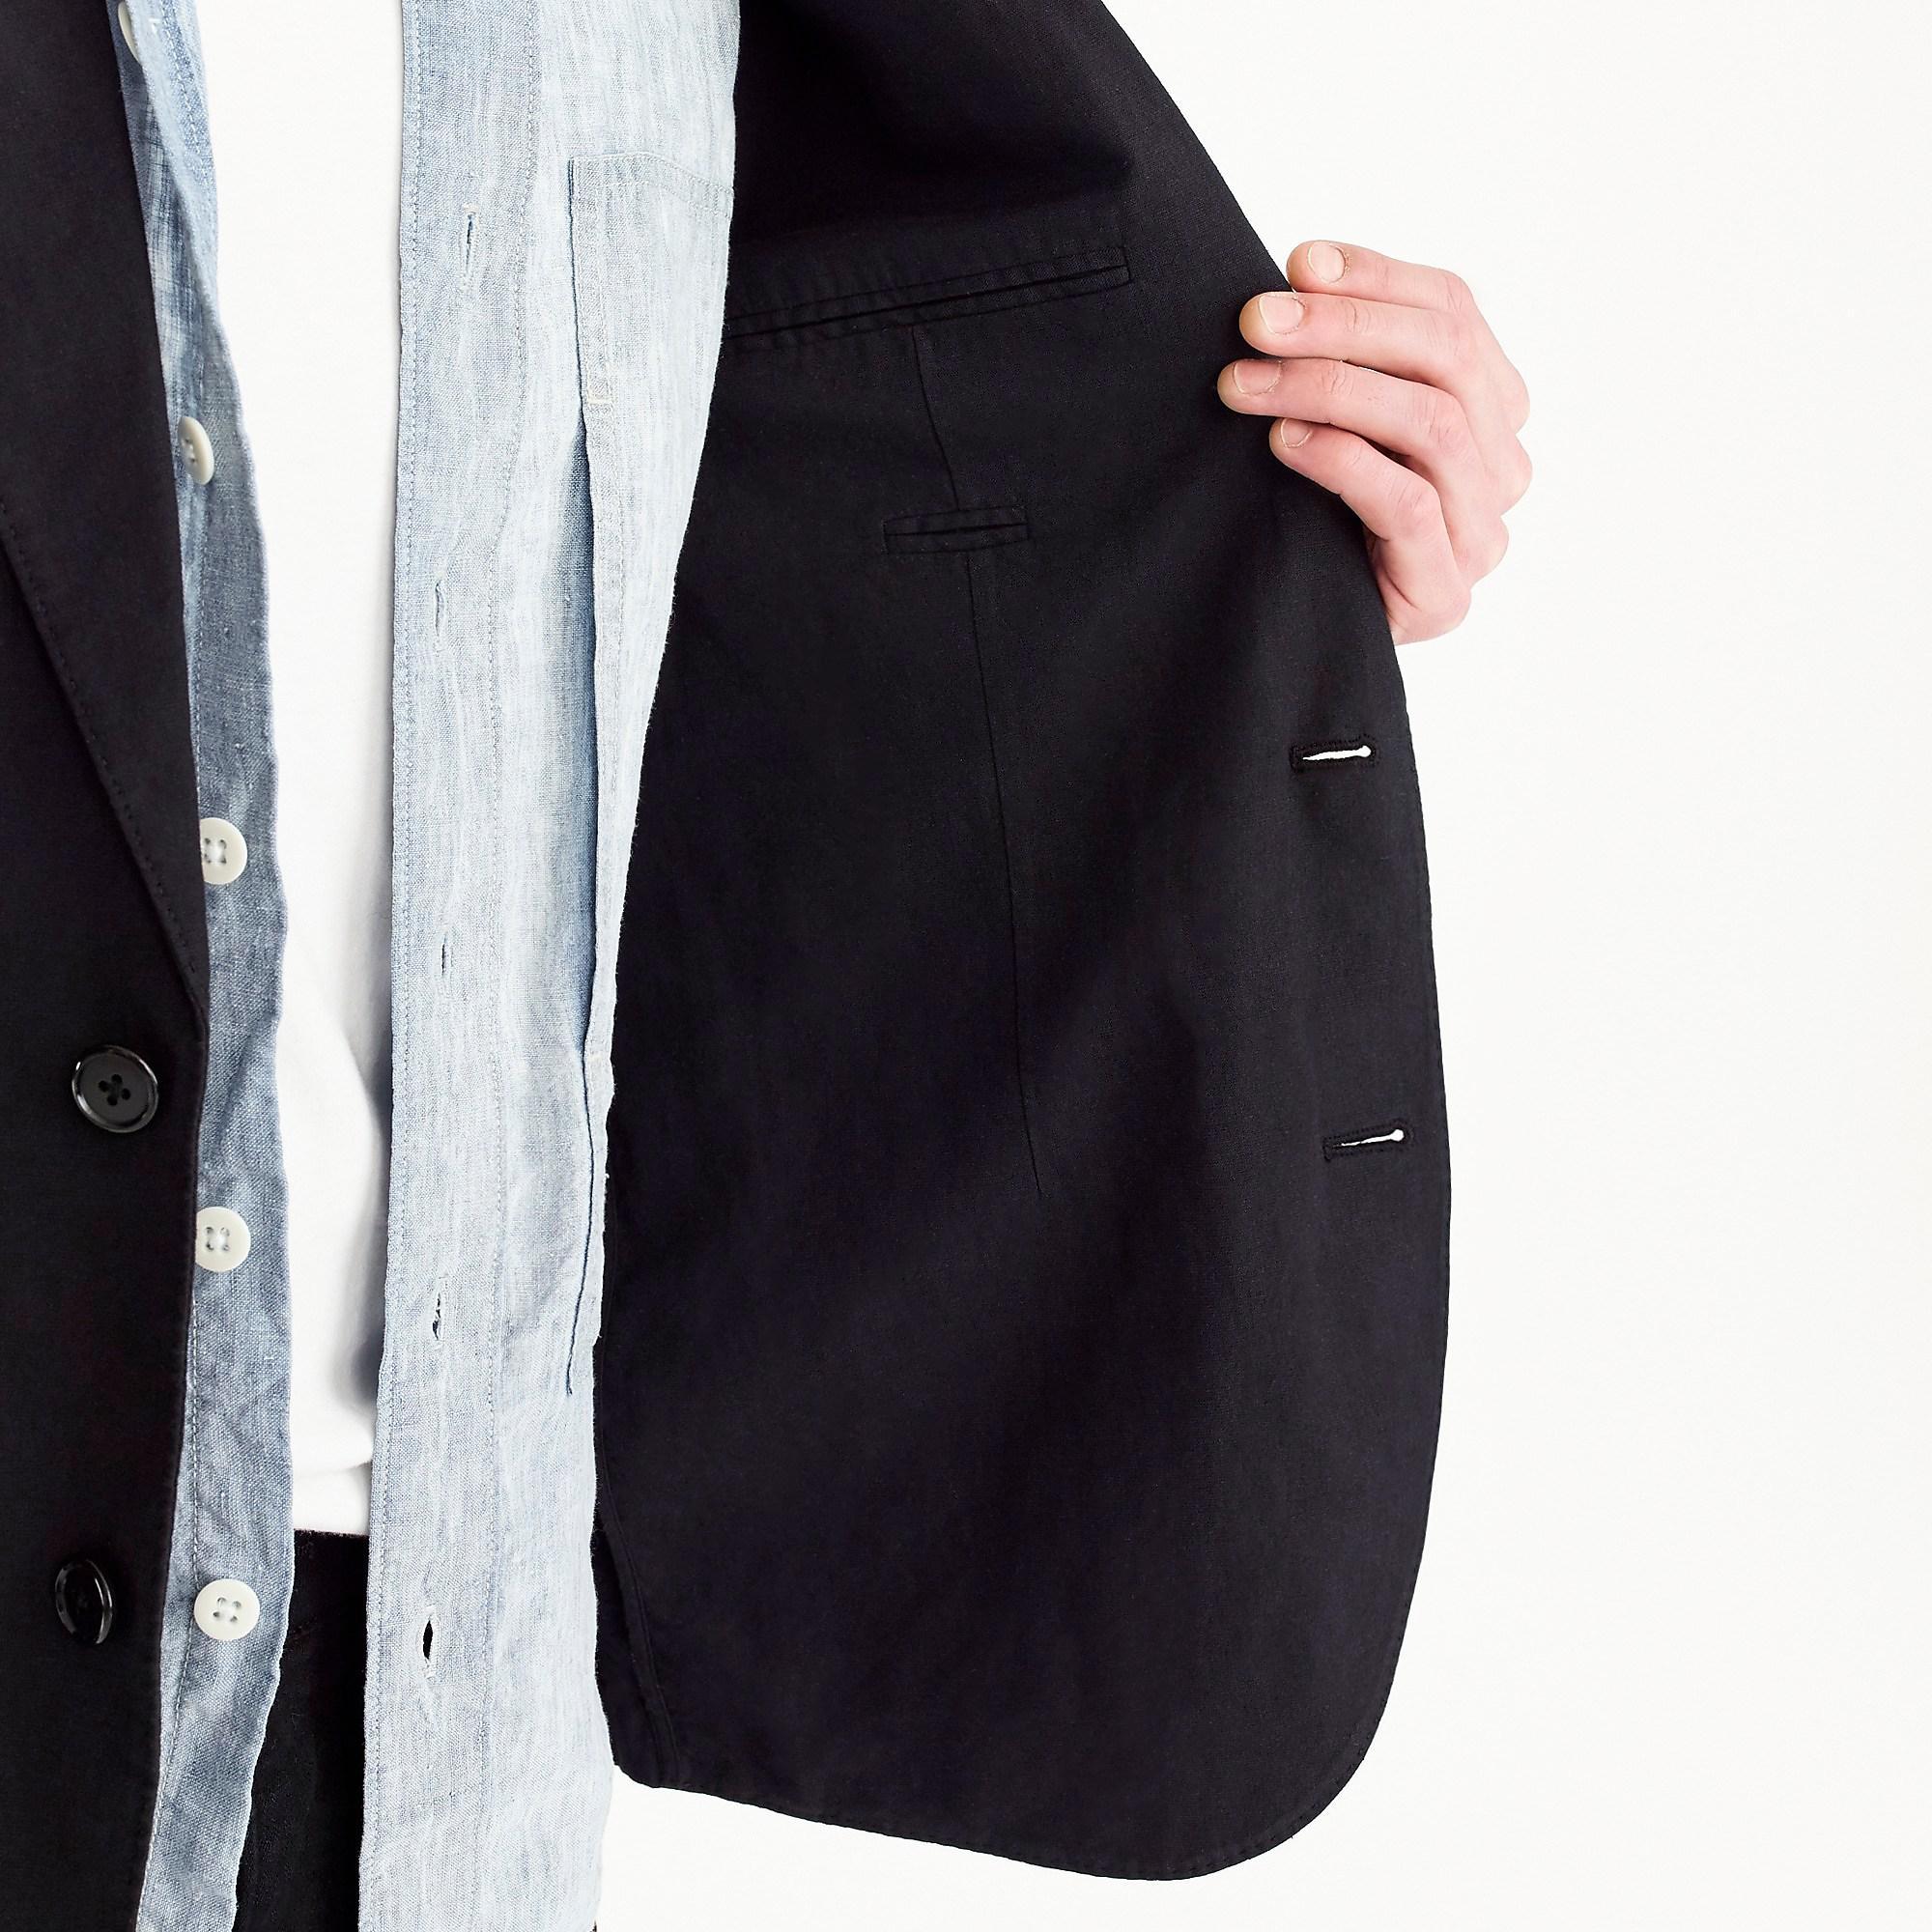 94684c64311a J.Crew Unstructured Slim-fit Ludlow Blazer In Garment-dyed Cotton ...